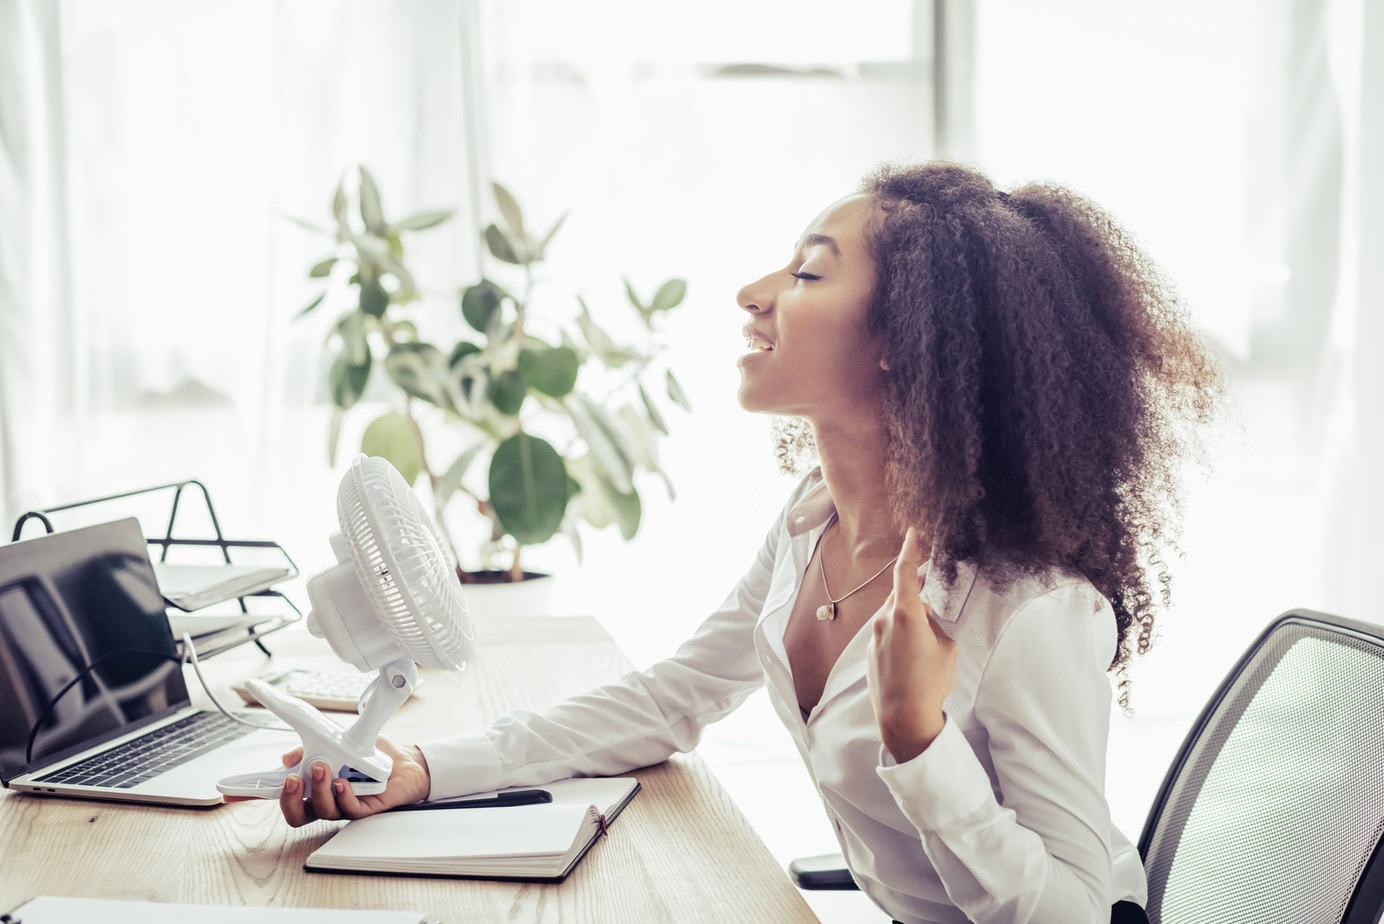 6 Best Desk Fans: Increase Office Air Flow & Comfort (2021)